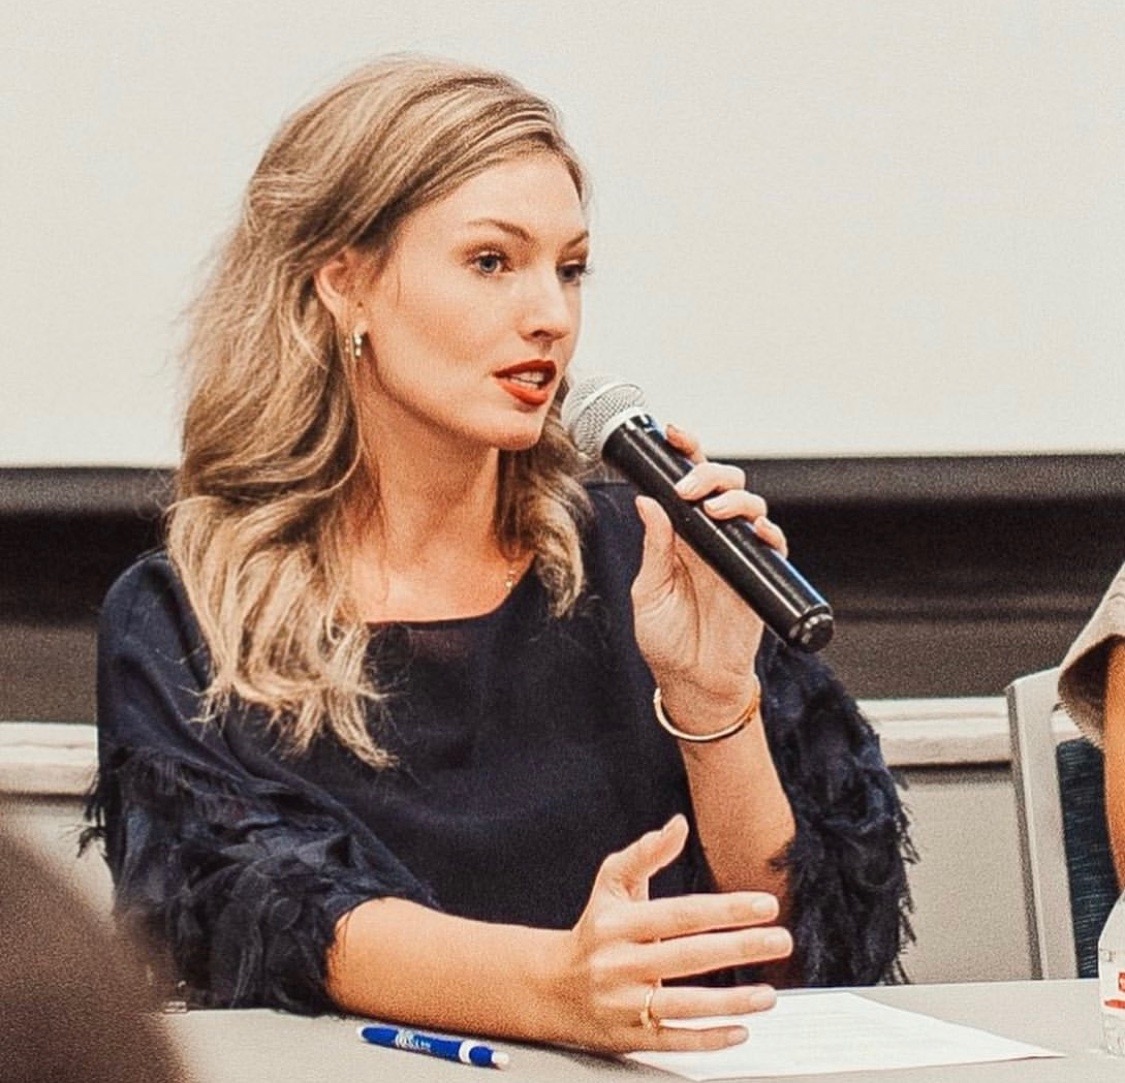 Natasha Overin, public relations, PR, Spokesperson